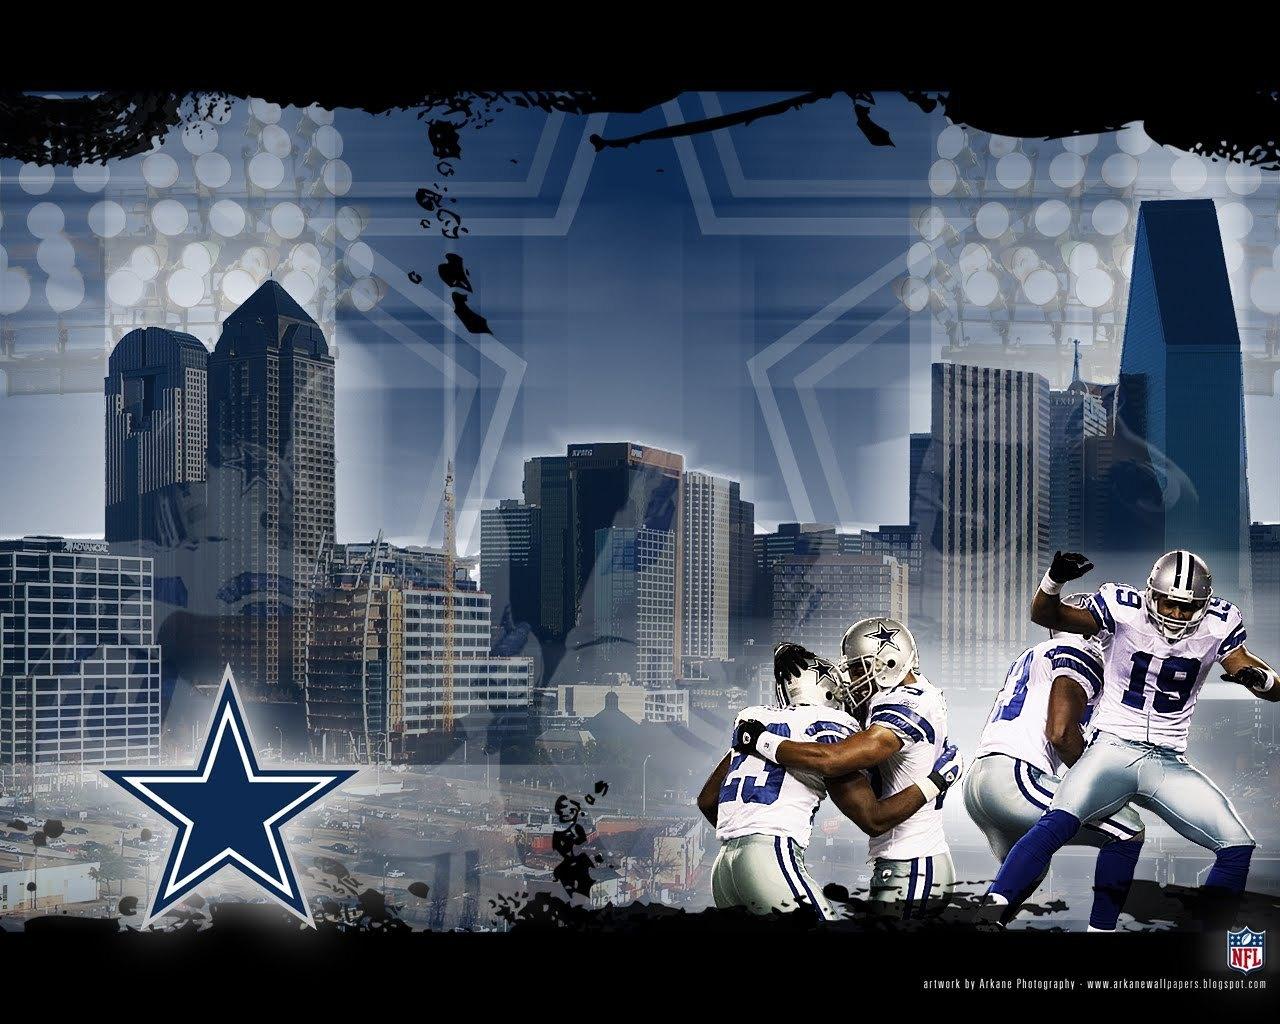 http://2.bp.blogspot.com/-JtG5jOWpdfQ/UNBFsMWfwUI/AAAAAAAAEuc/eWs3JMZi8Dw/s1600/Dallas-Cowboys-dallas-cowboys-9173303-1280-1024.jpg